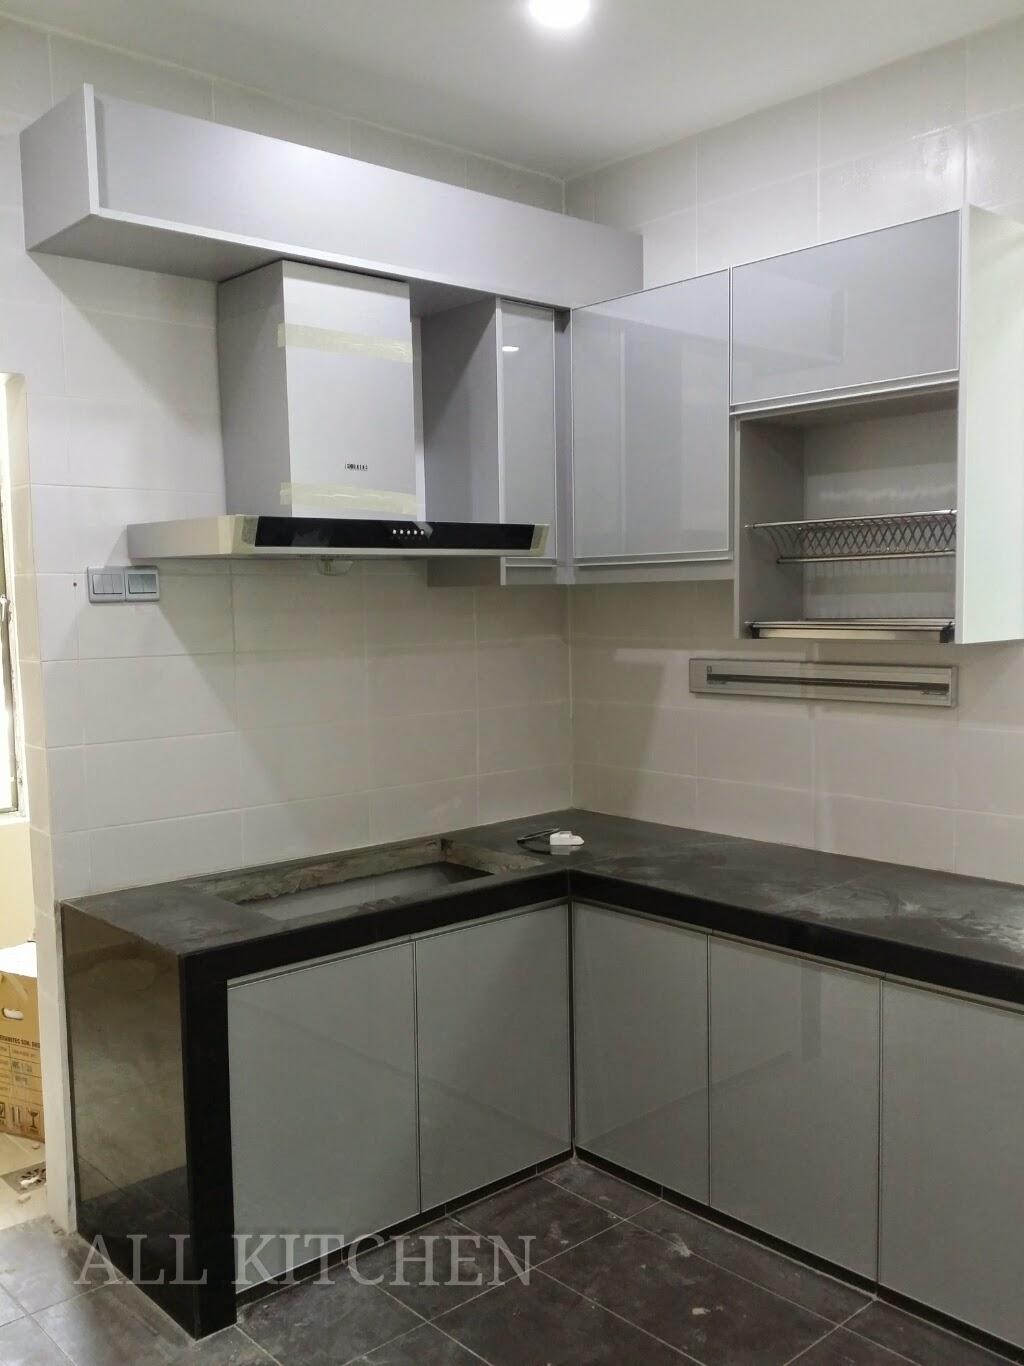 Kabinet dapur bandar teknologi kajang 2 for Harga kitchen cabinet